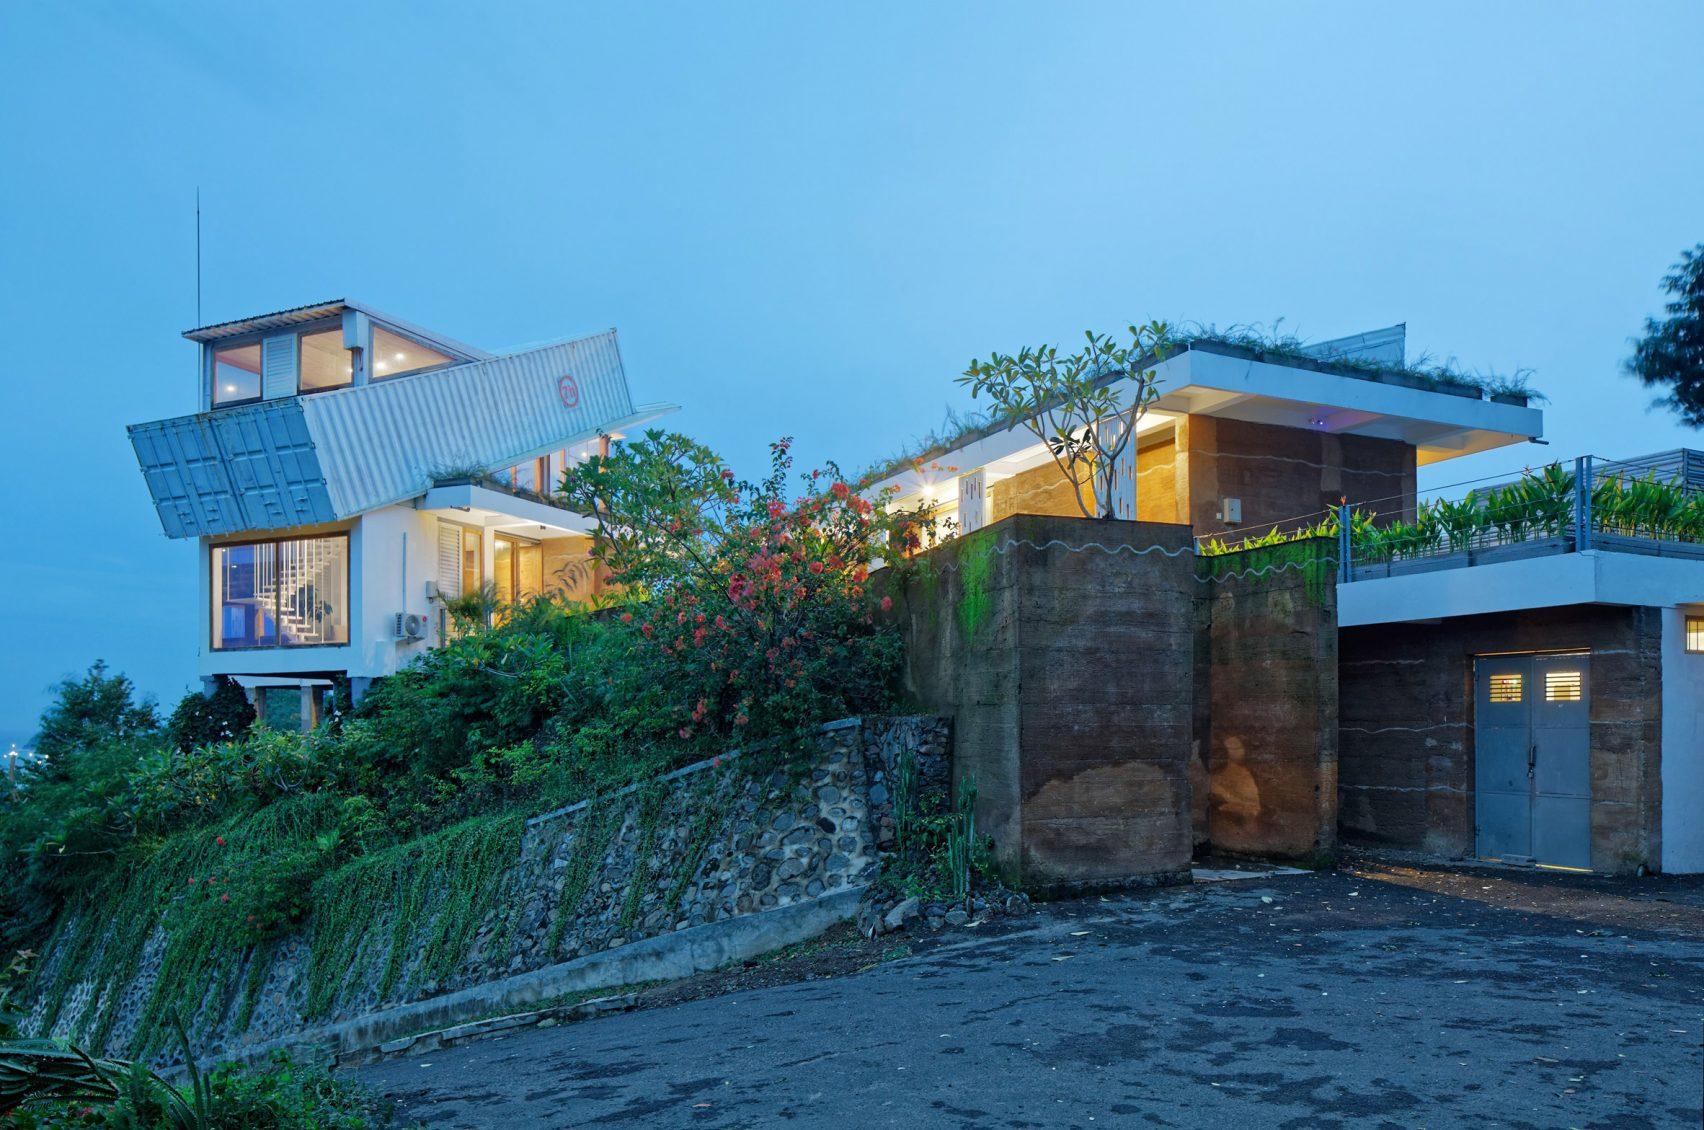 clay-house-budi-pradono-architects-architecture_dezeen_2364_col_12-1704x1130.jpg